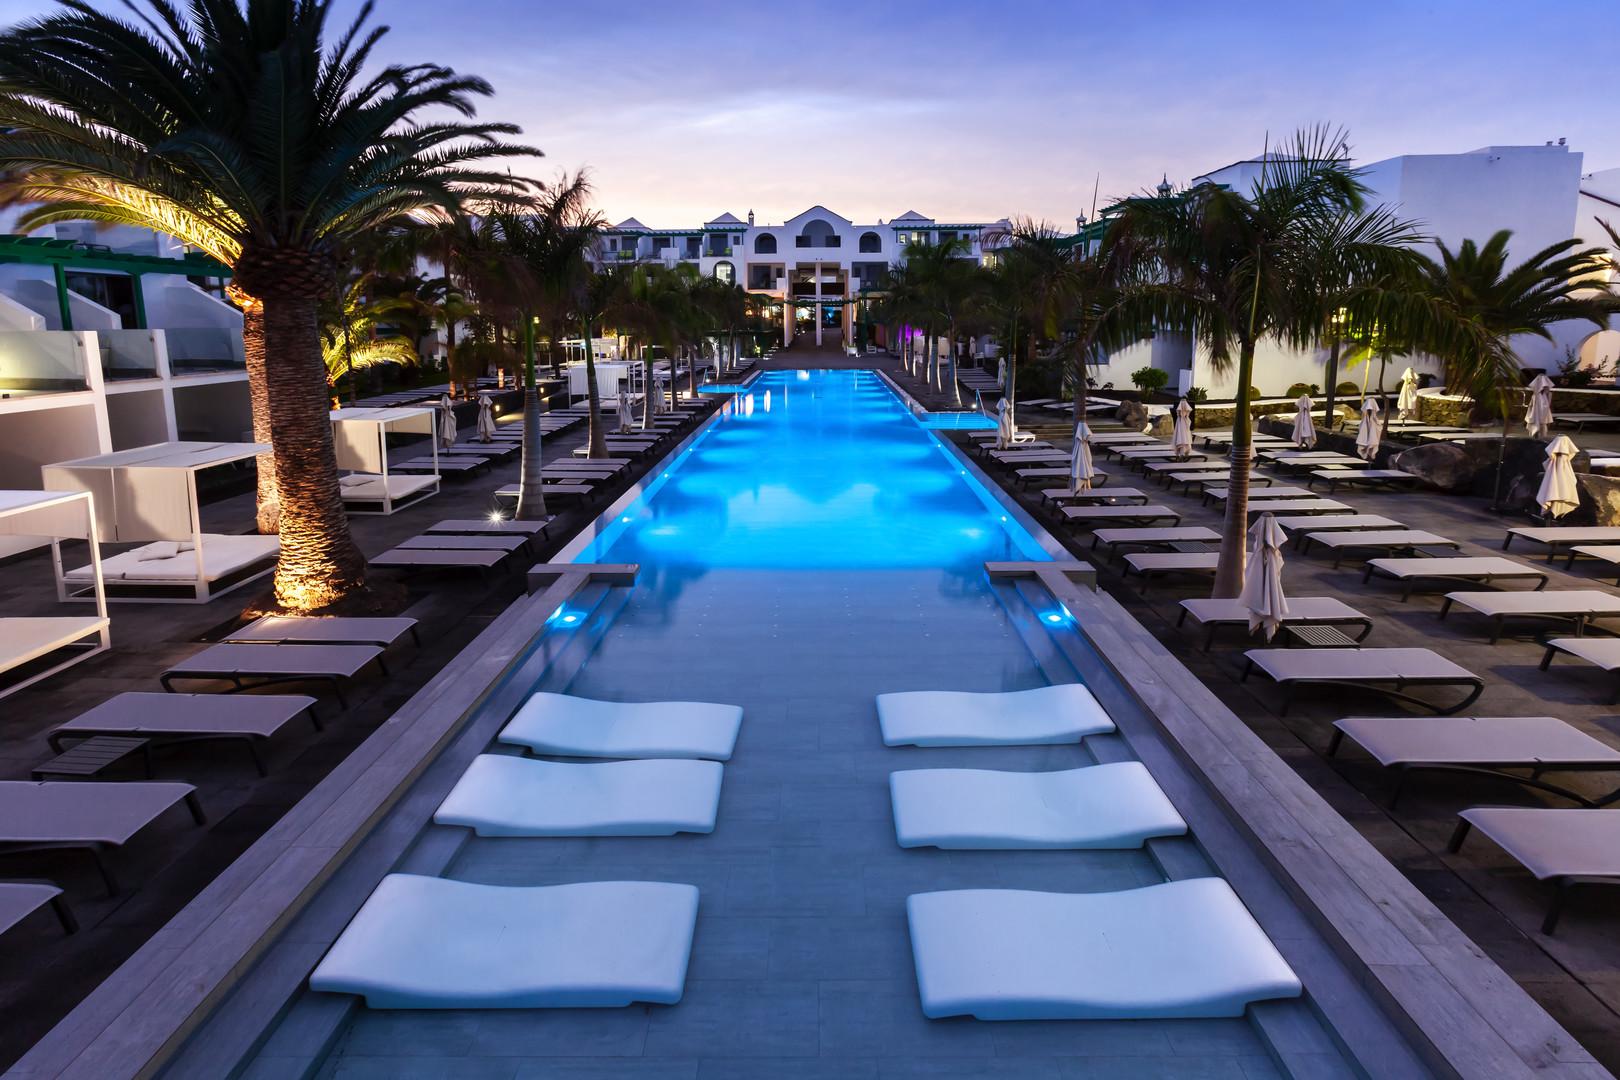 Hotel Barcelo Teguise Beach #3